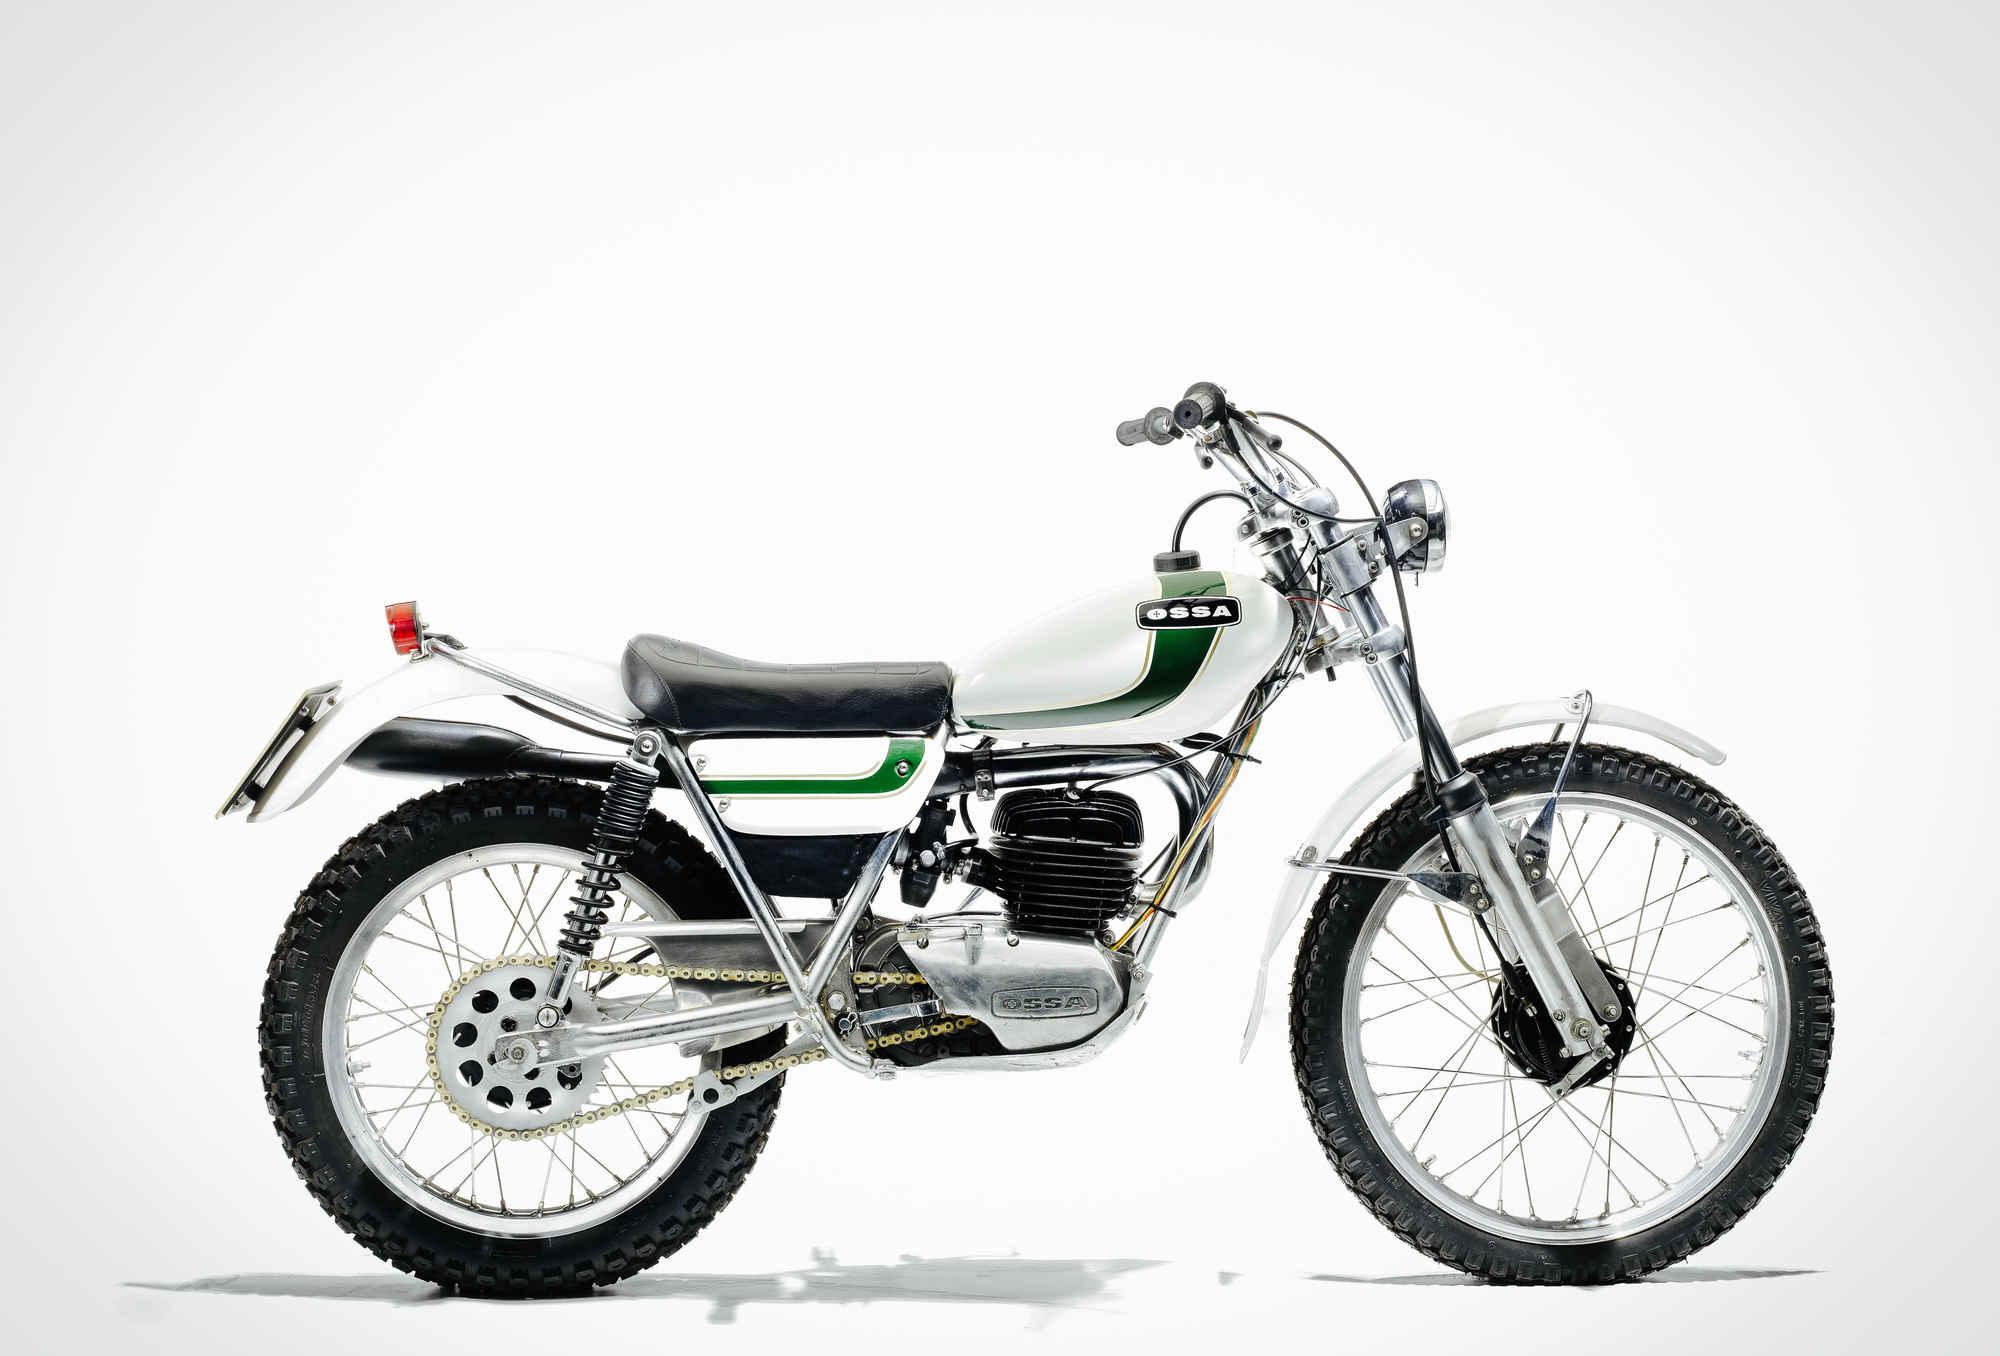 1980 Ossa 250CC MAR Trials Motorcycle